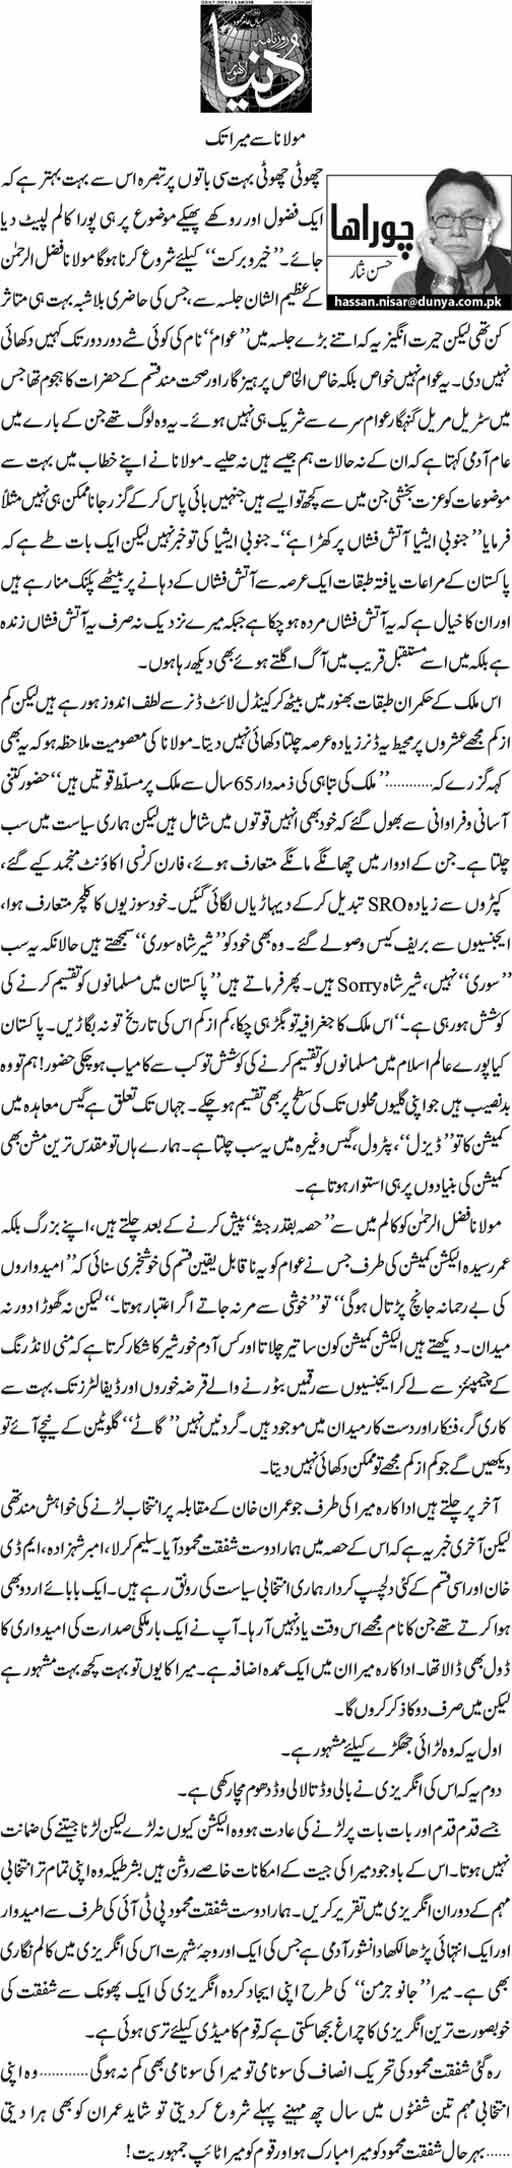 Moulana Se Meera Tak - Hassan Nisar